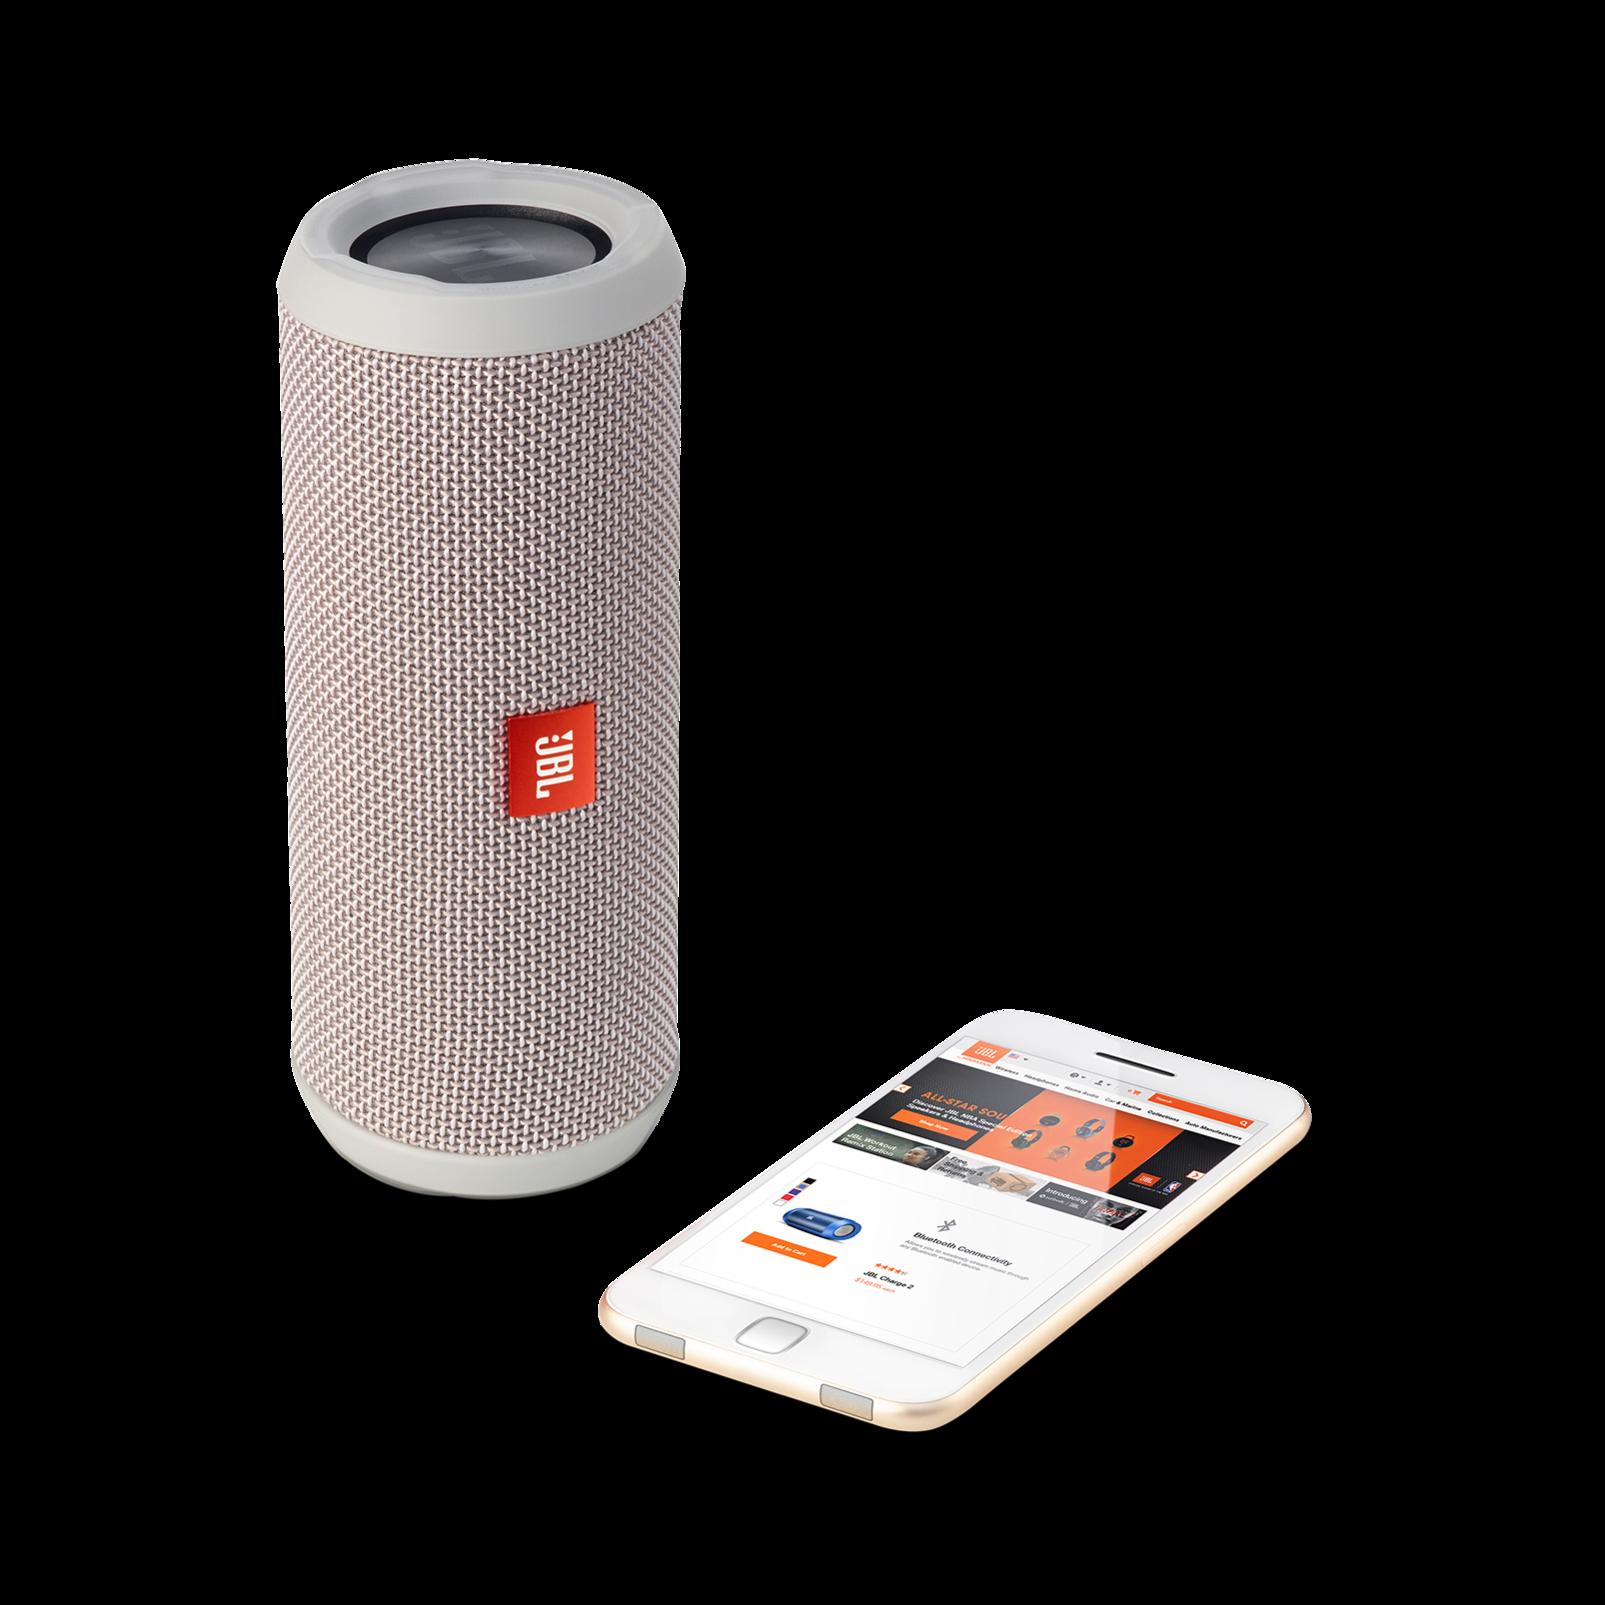 JBL Flip 3 - Grey - Splashproof portable Bluetooth speaker with powerful sound and speakerphone technology - Detailshot 1